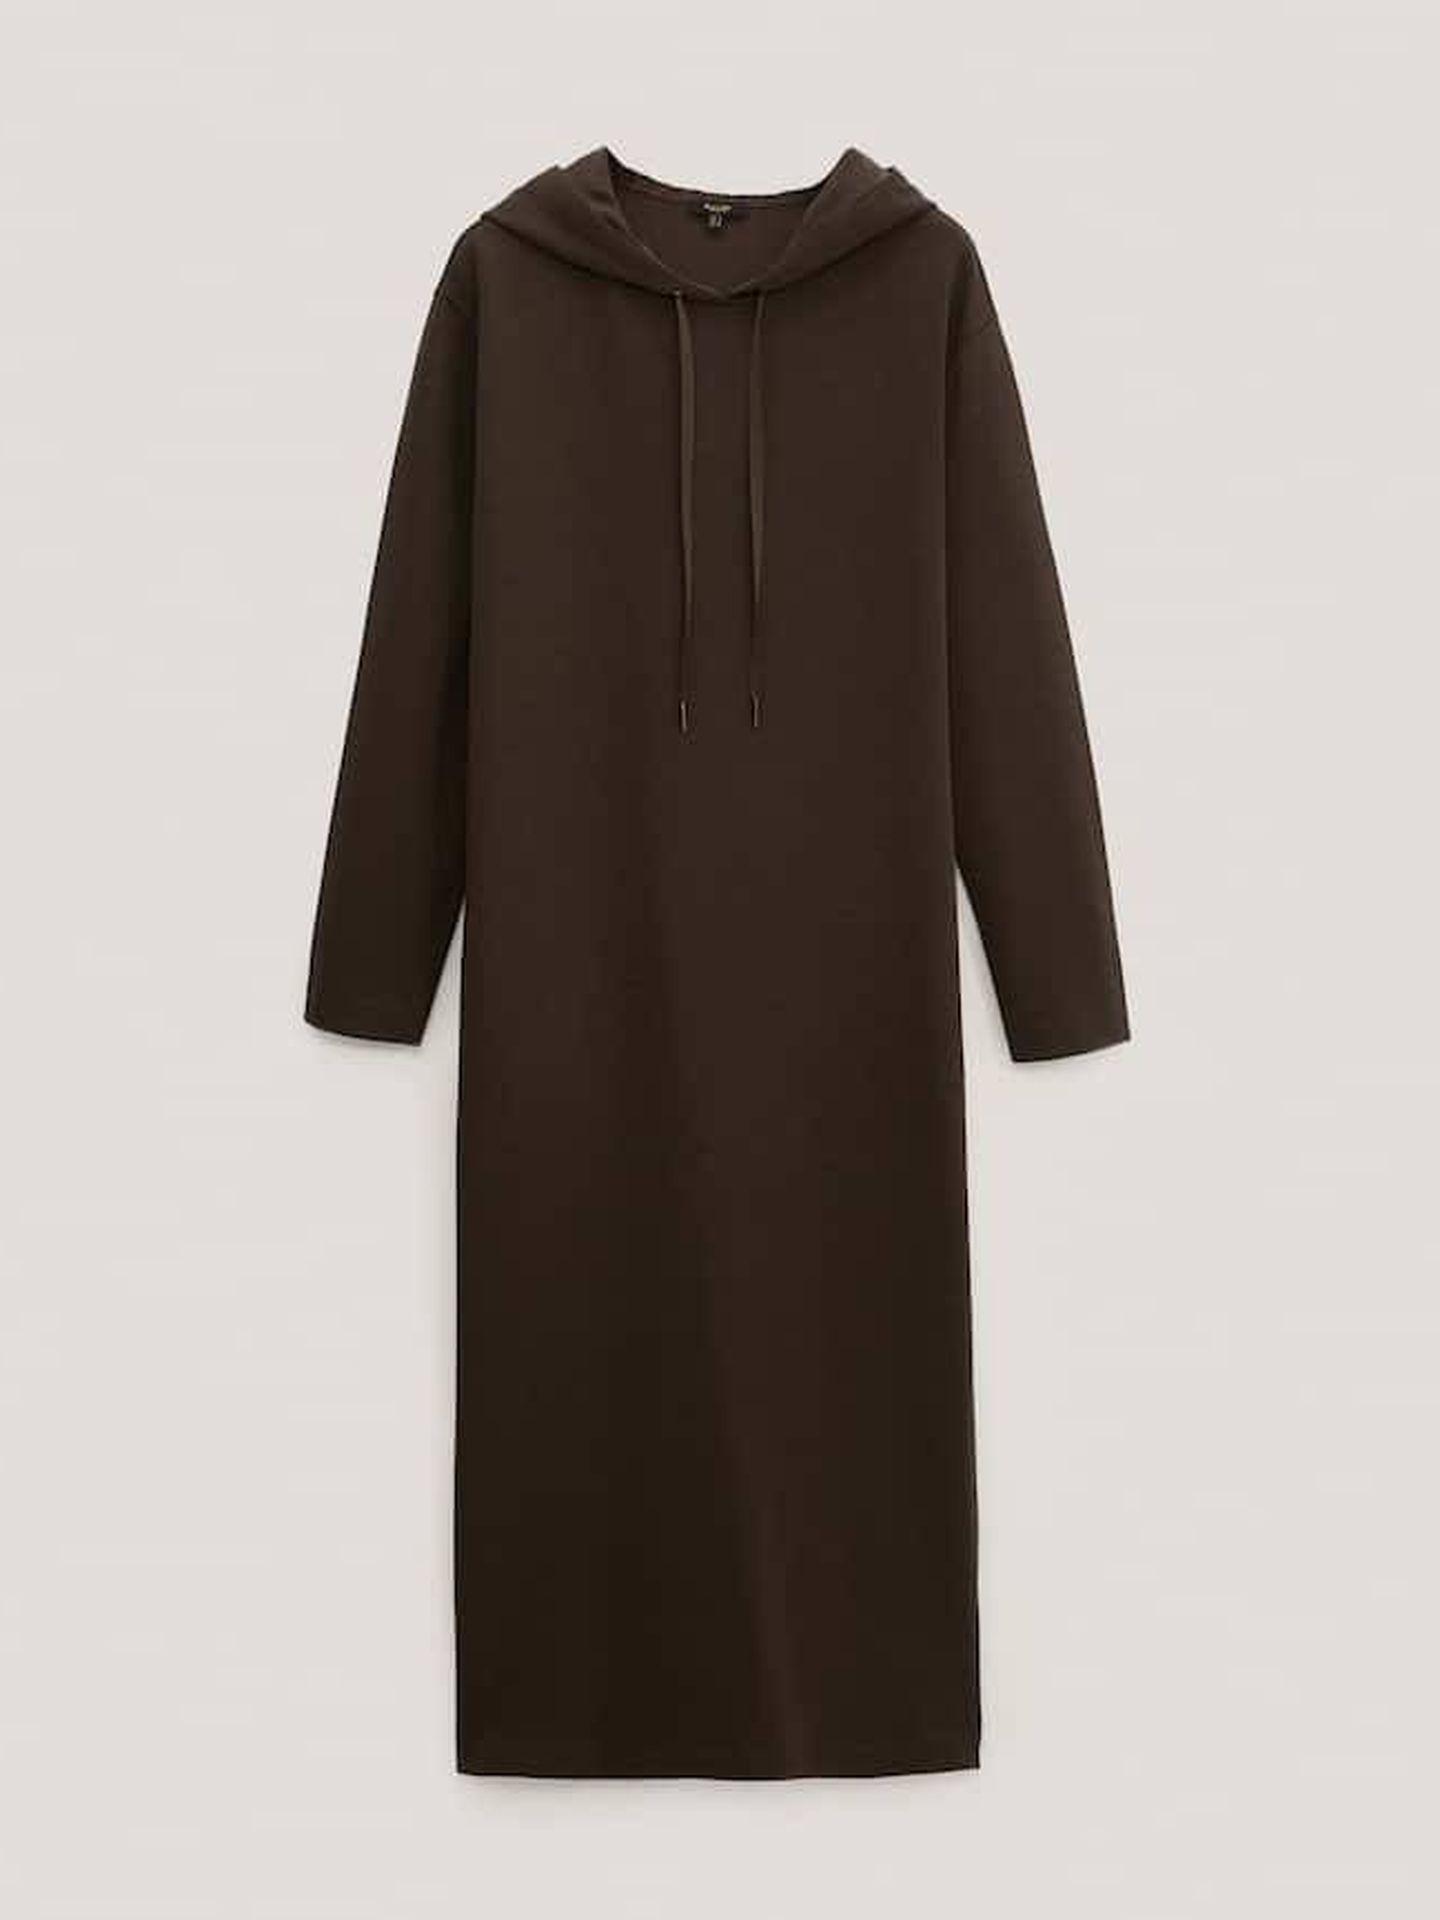 Sudadera vestido de Massimo Dutti. (Cortesía)